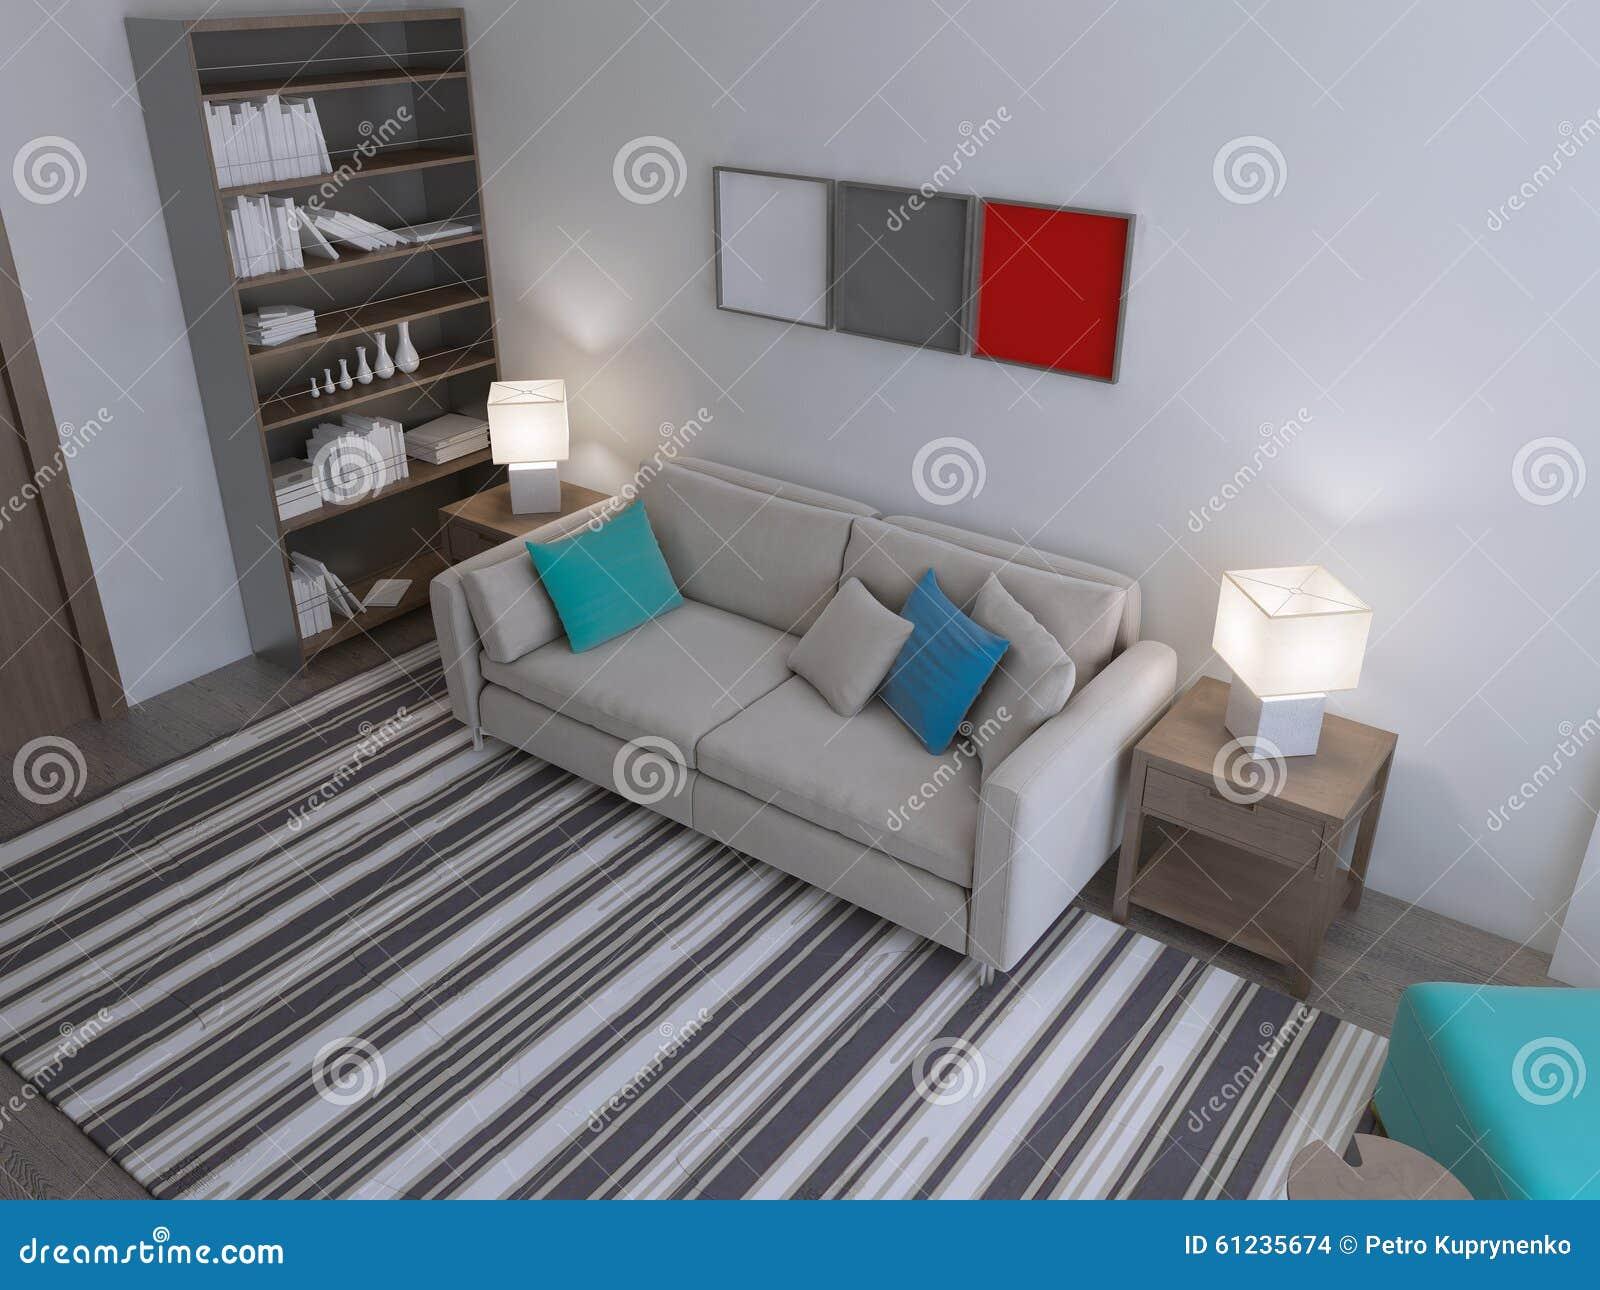 Idea For Cloth Wall In A Dark Room